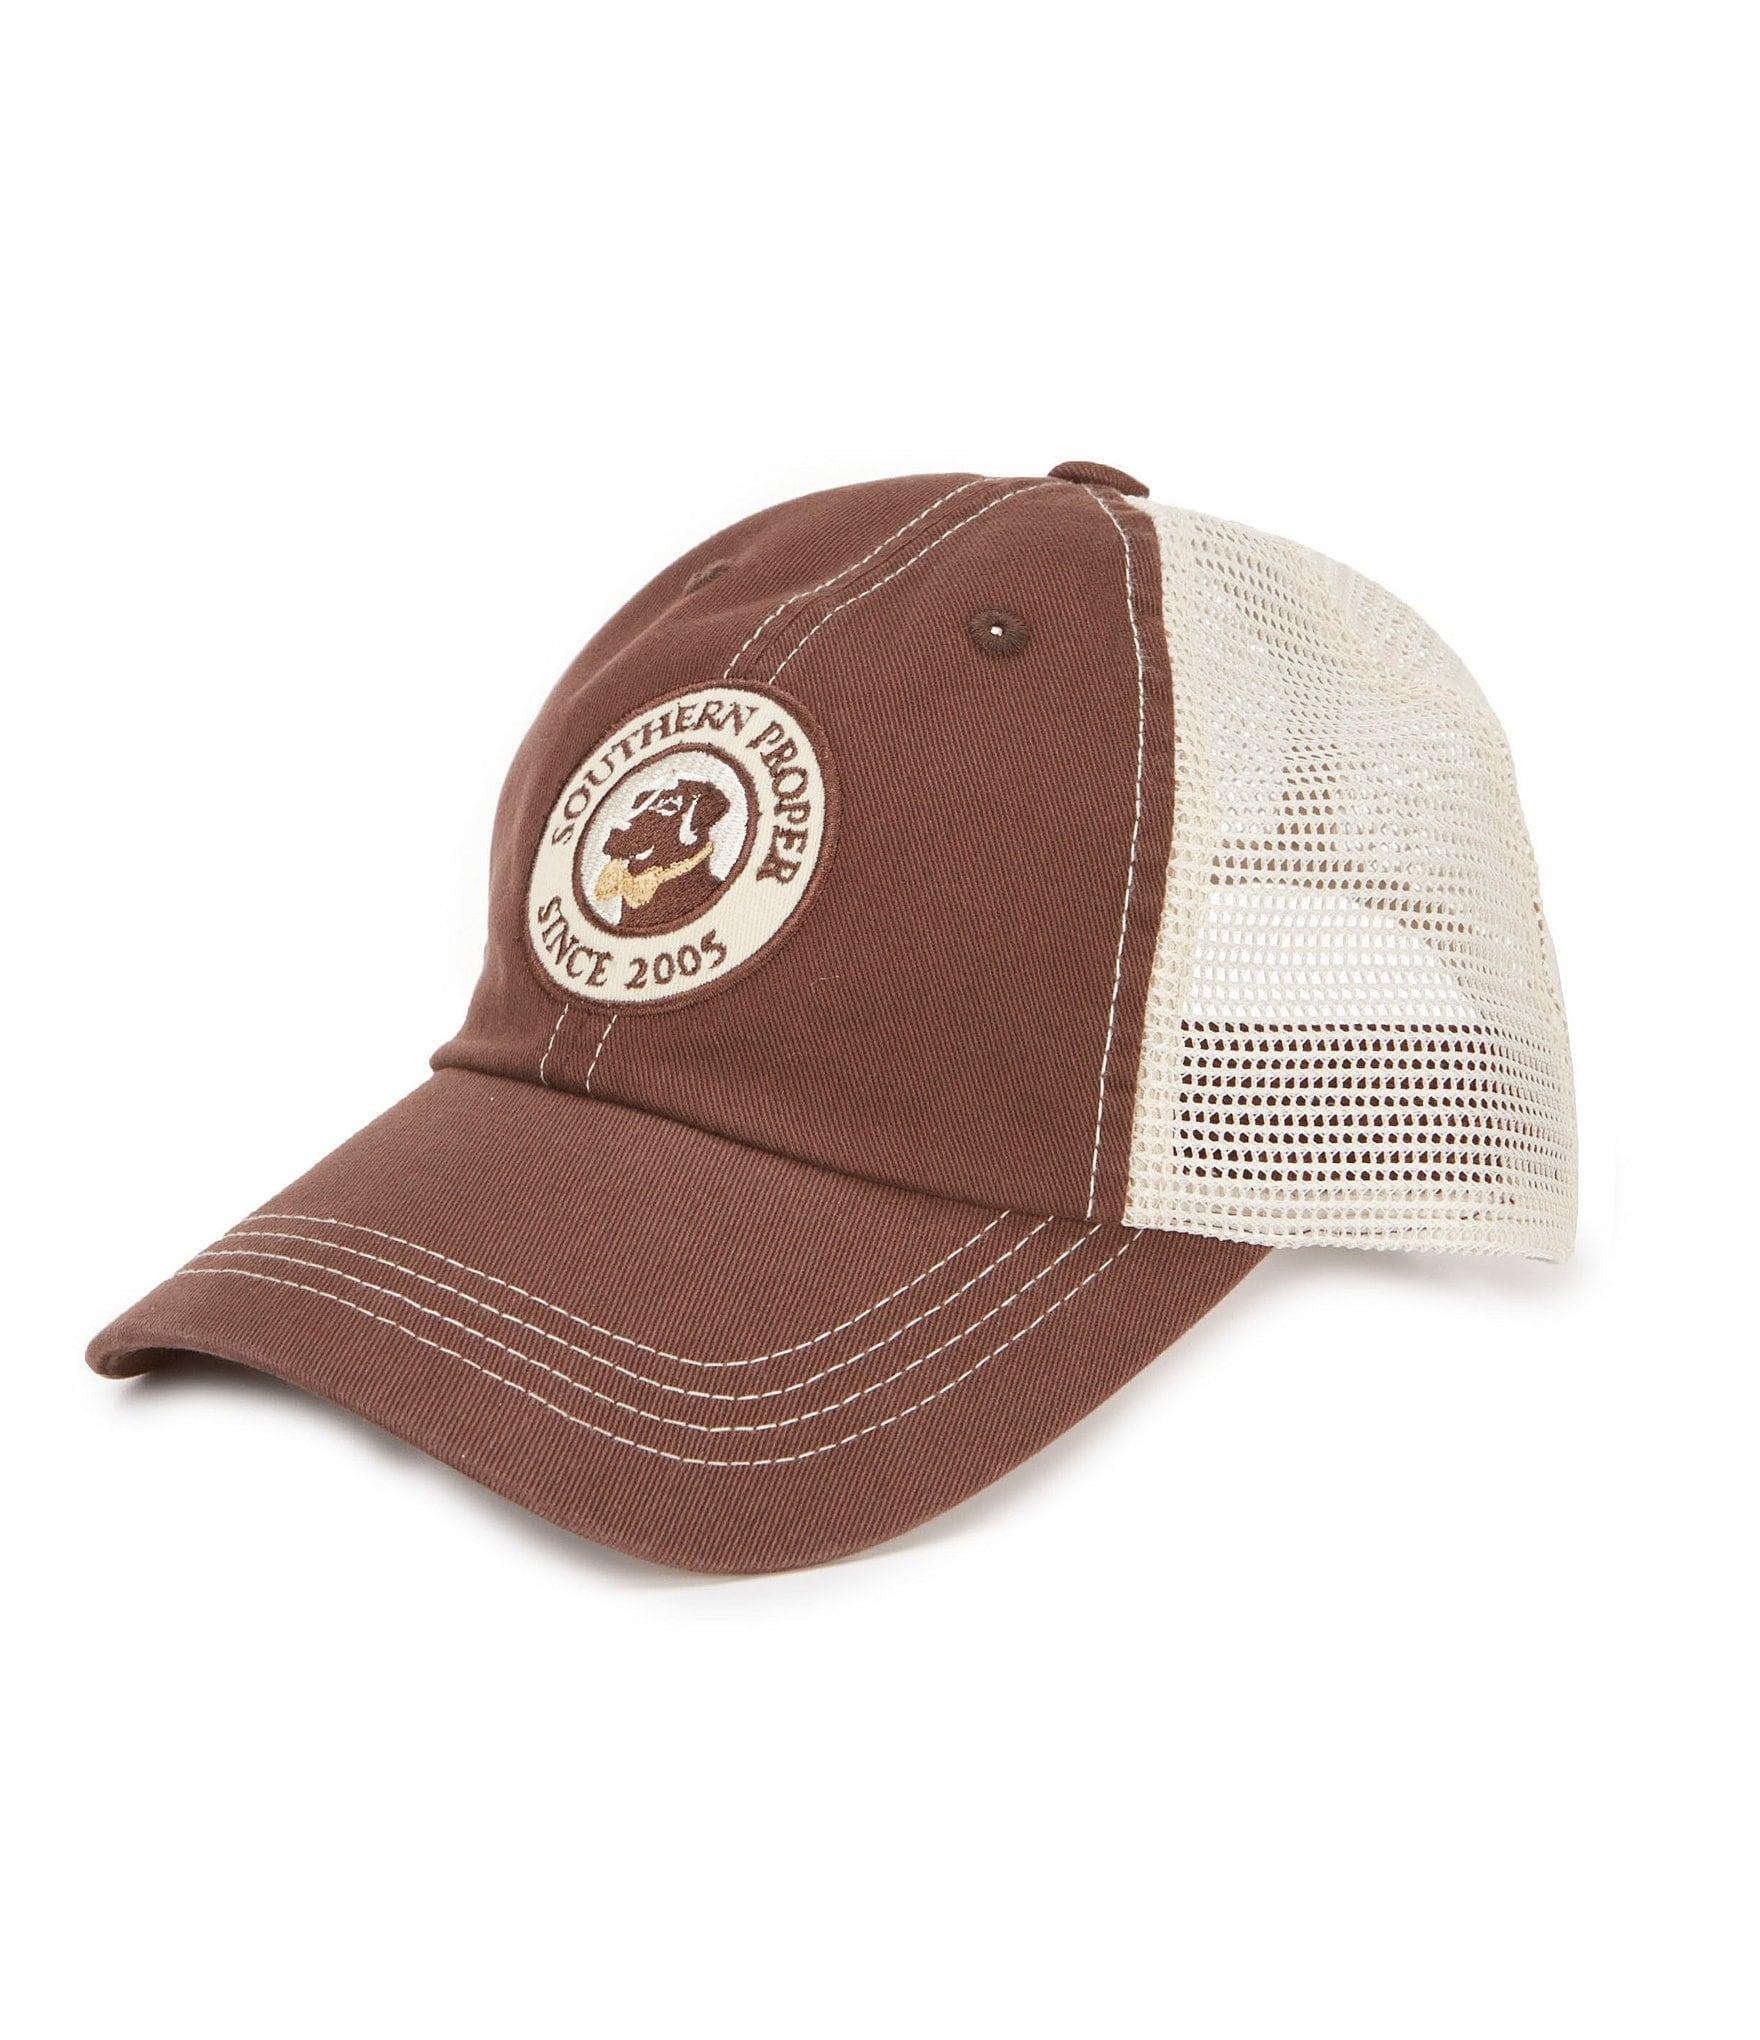 southern proper frat hat dillards